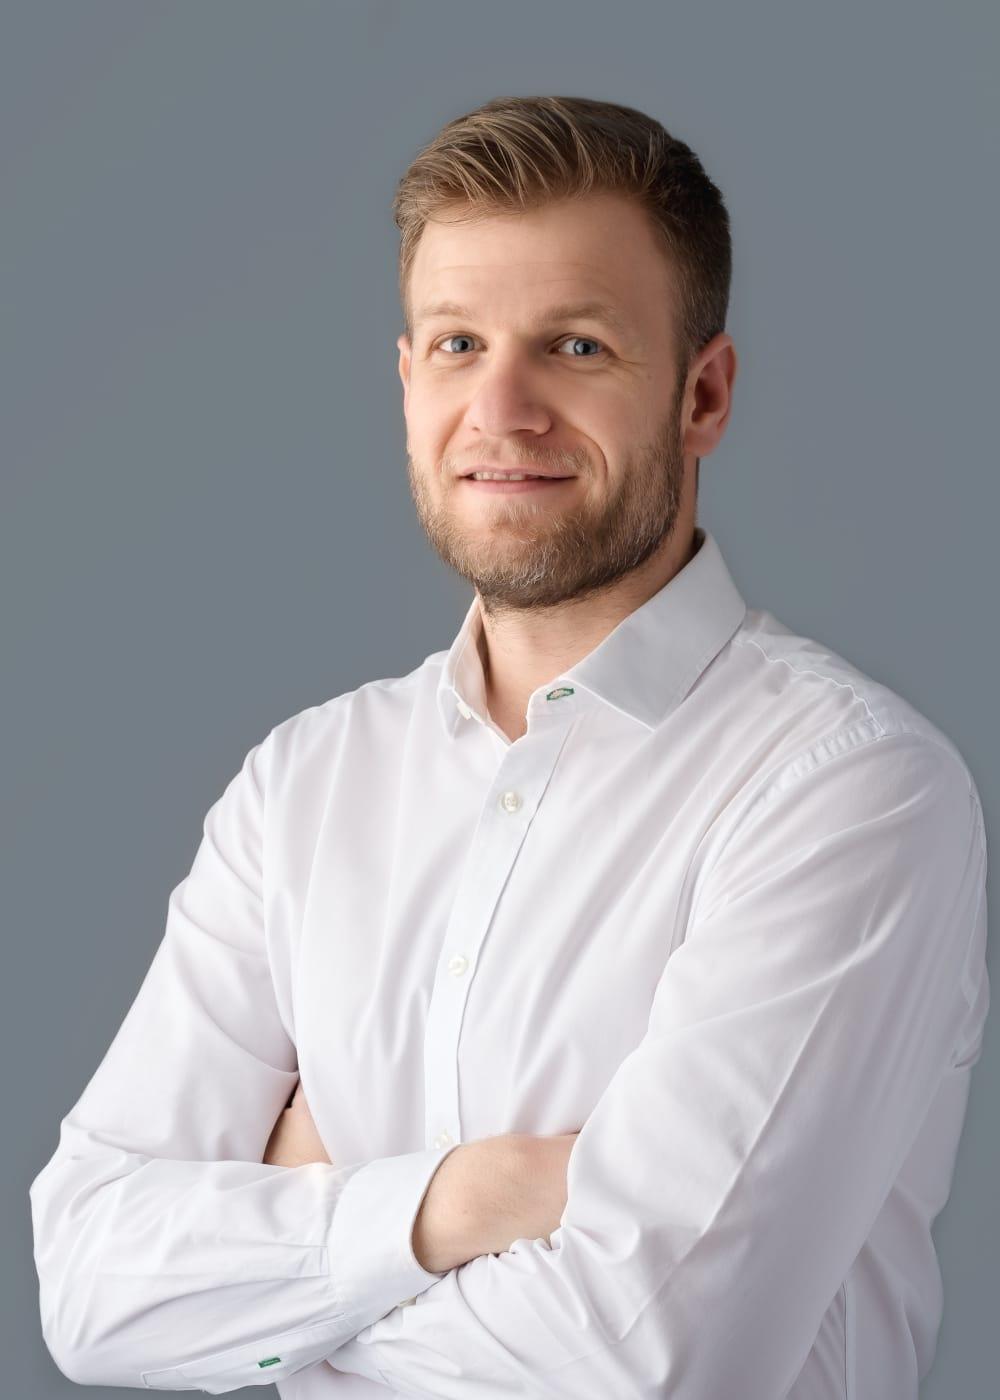 Dr. Farkas Bence